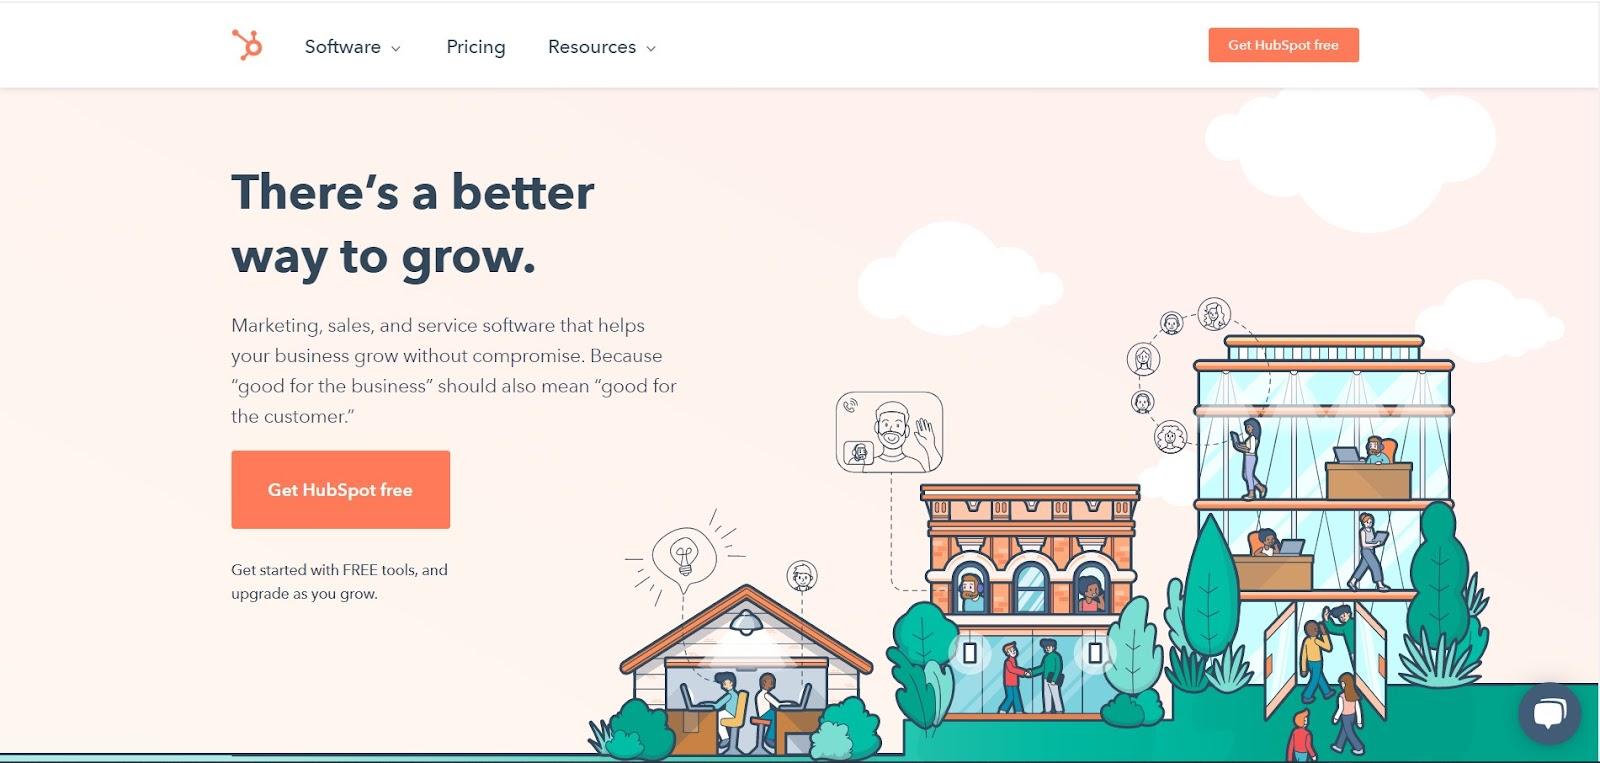 hubspot tool for sales team